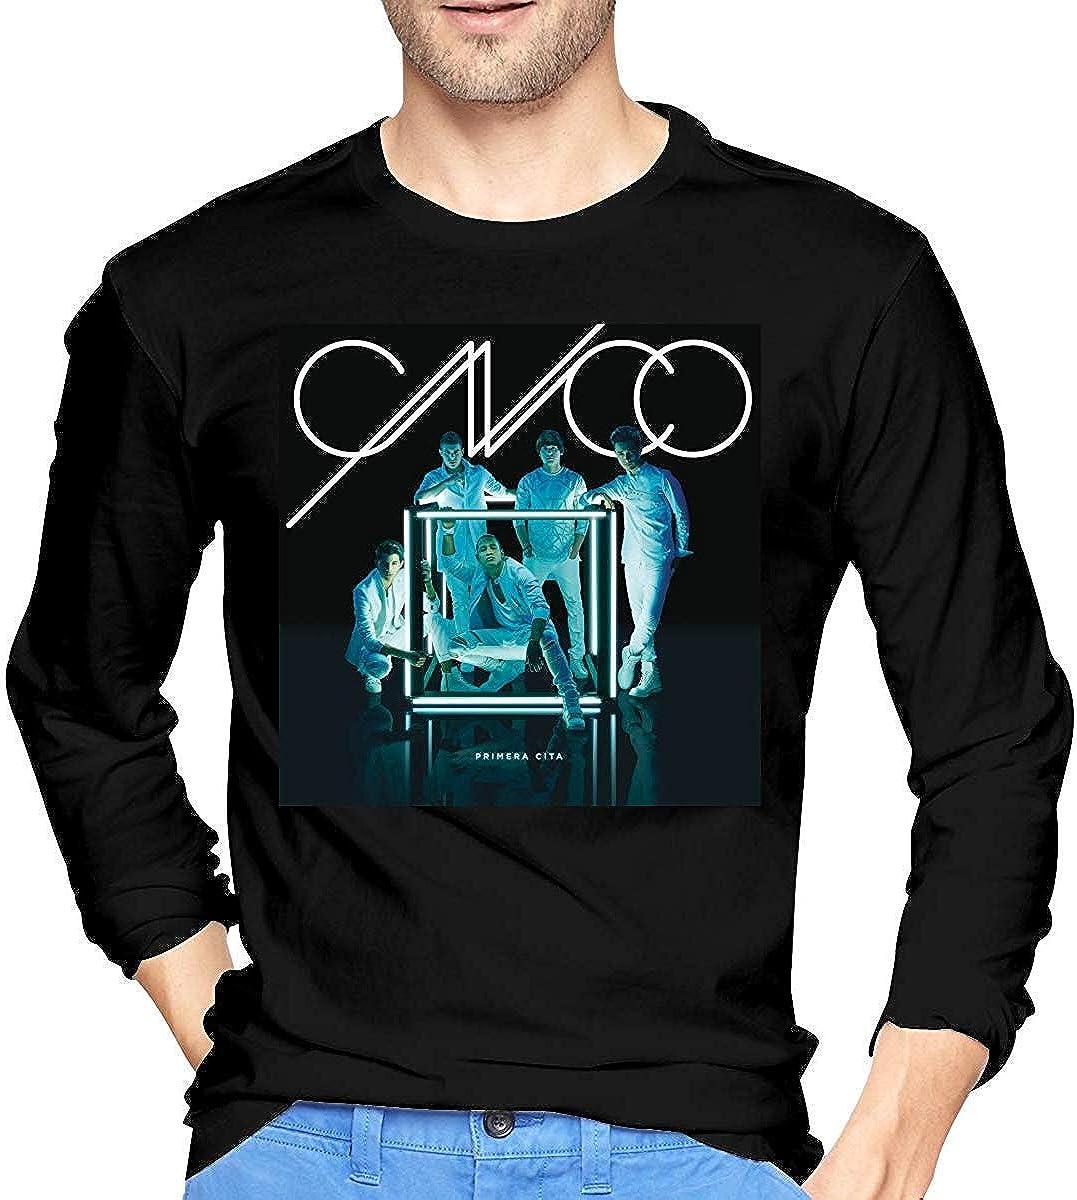 Cnco Casualstylish - Camiseta de Manga Larga para Hombre ...